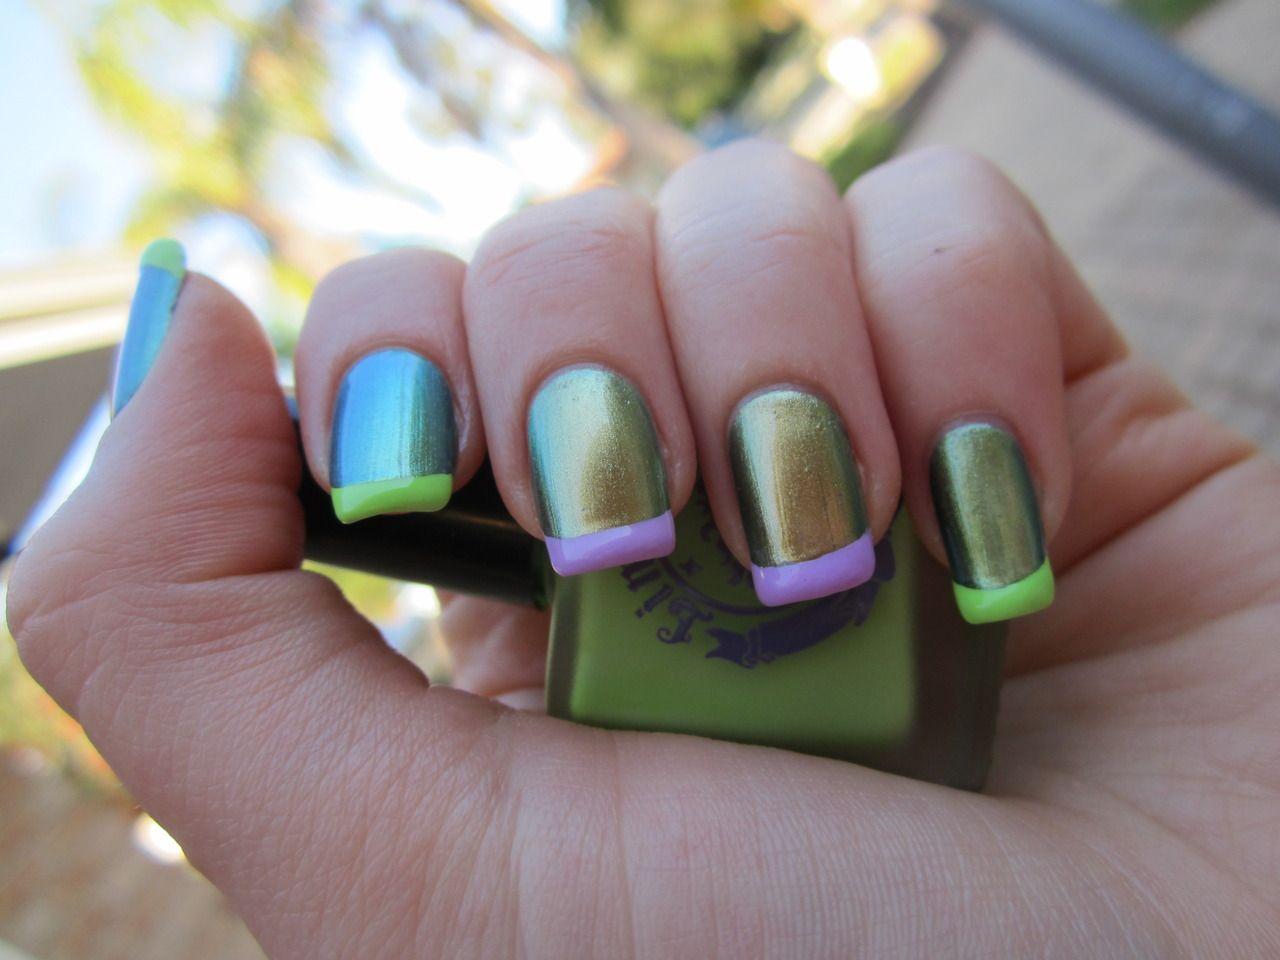 I like nail polish that changes color depending on the angle you ...